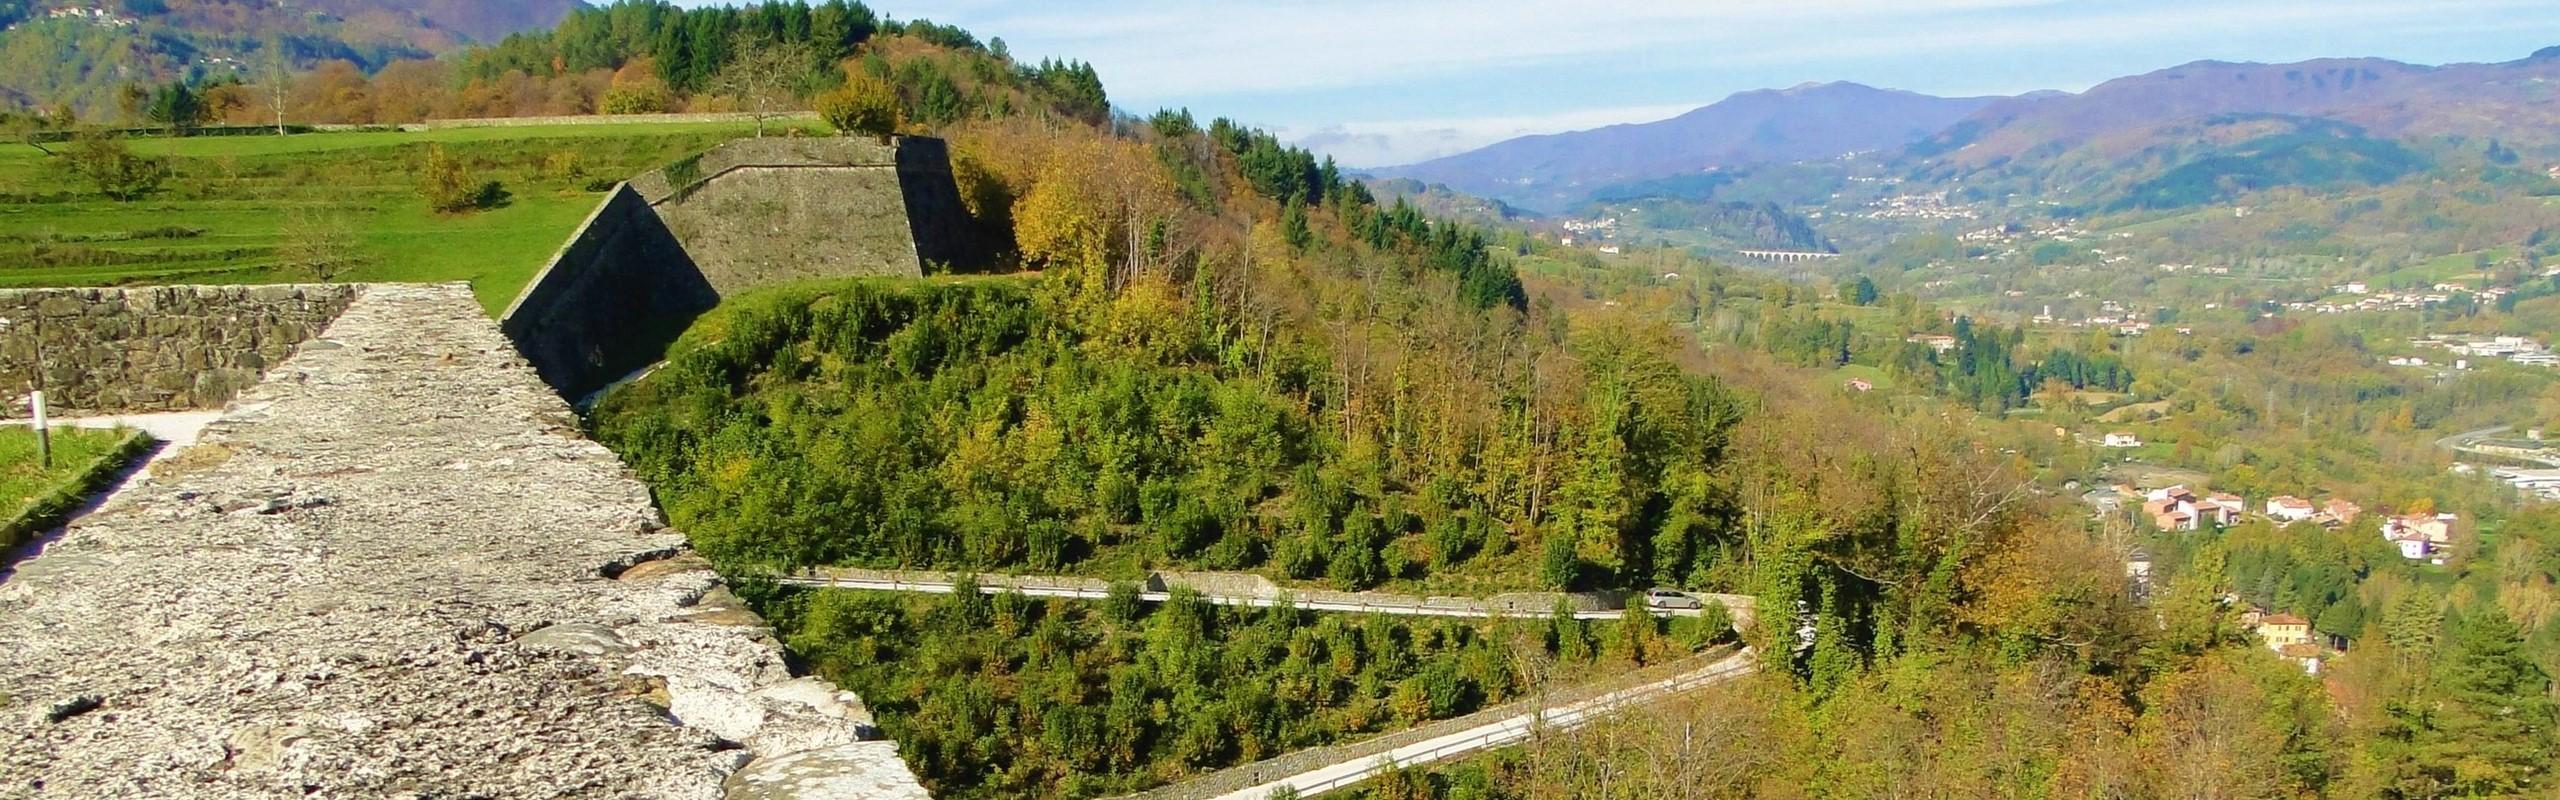 Castelnuovo Fortress